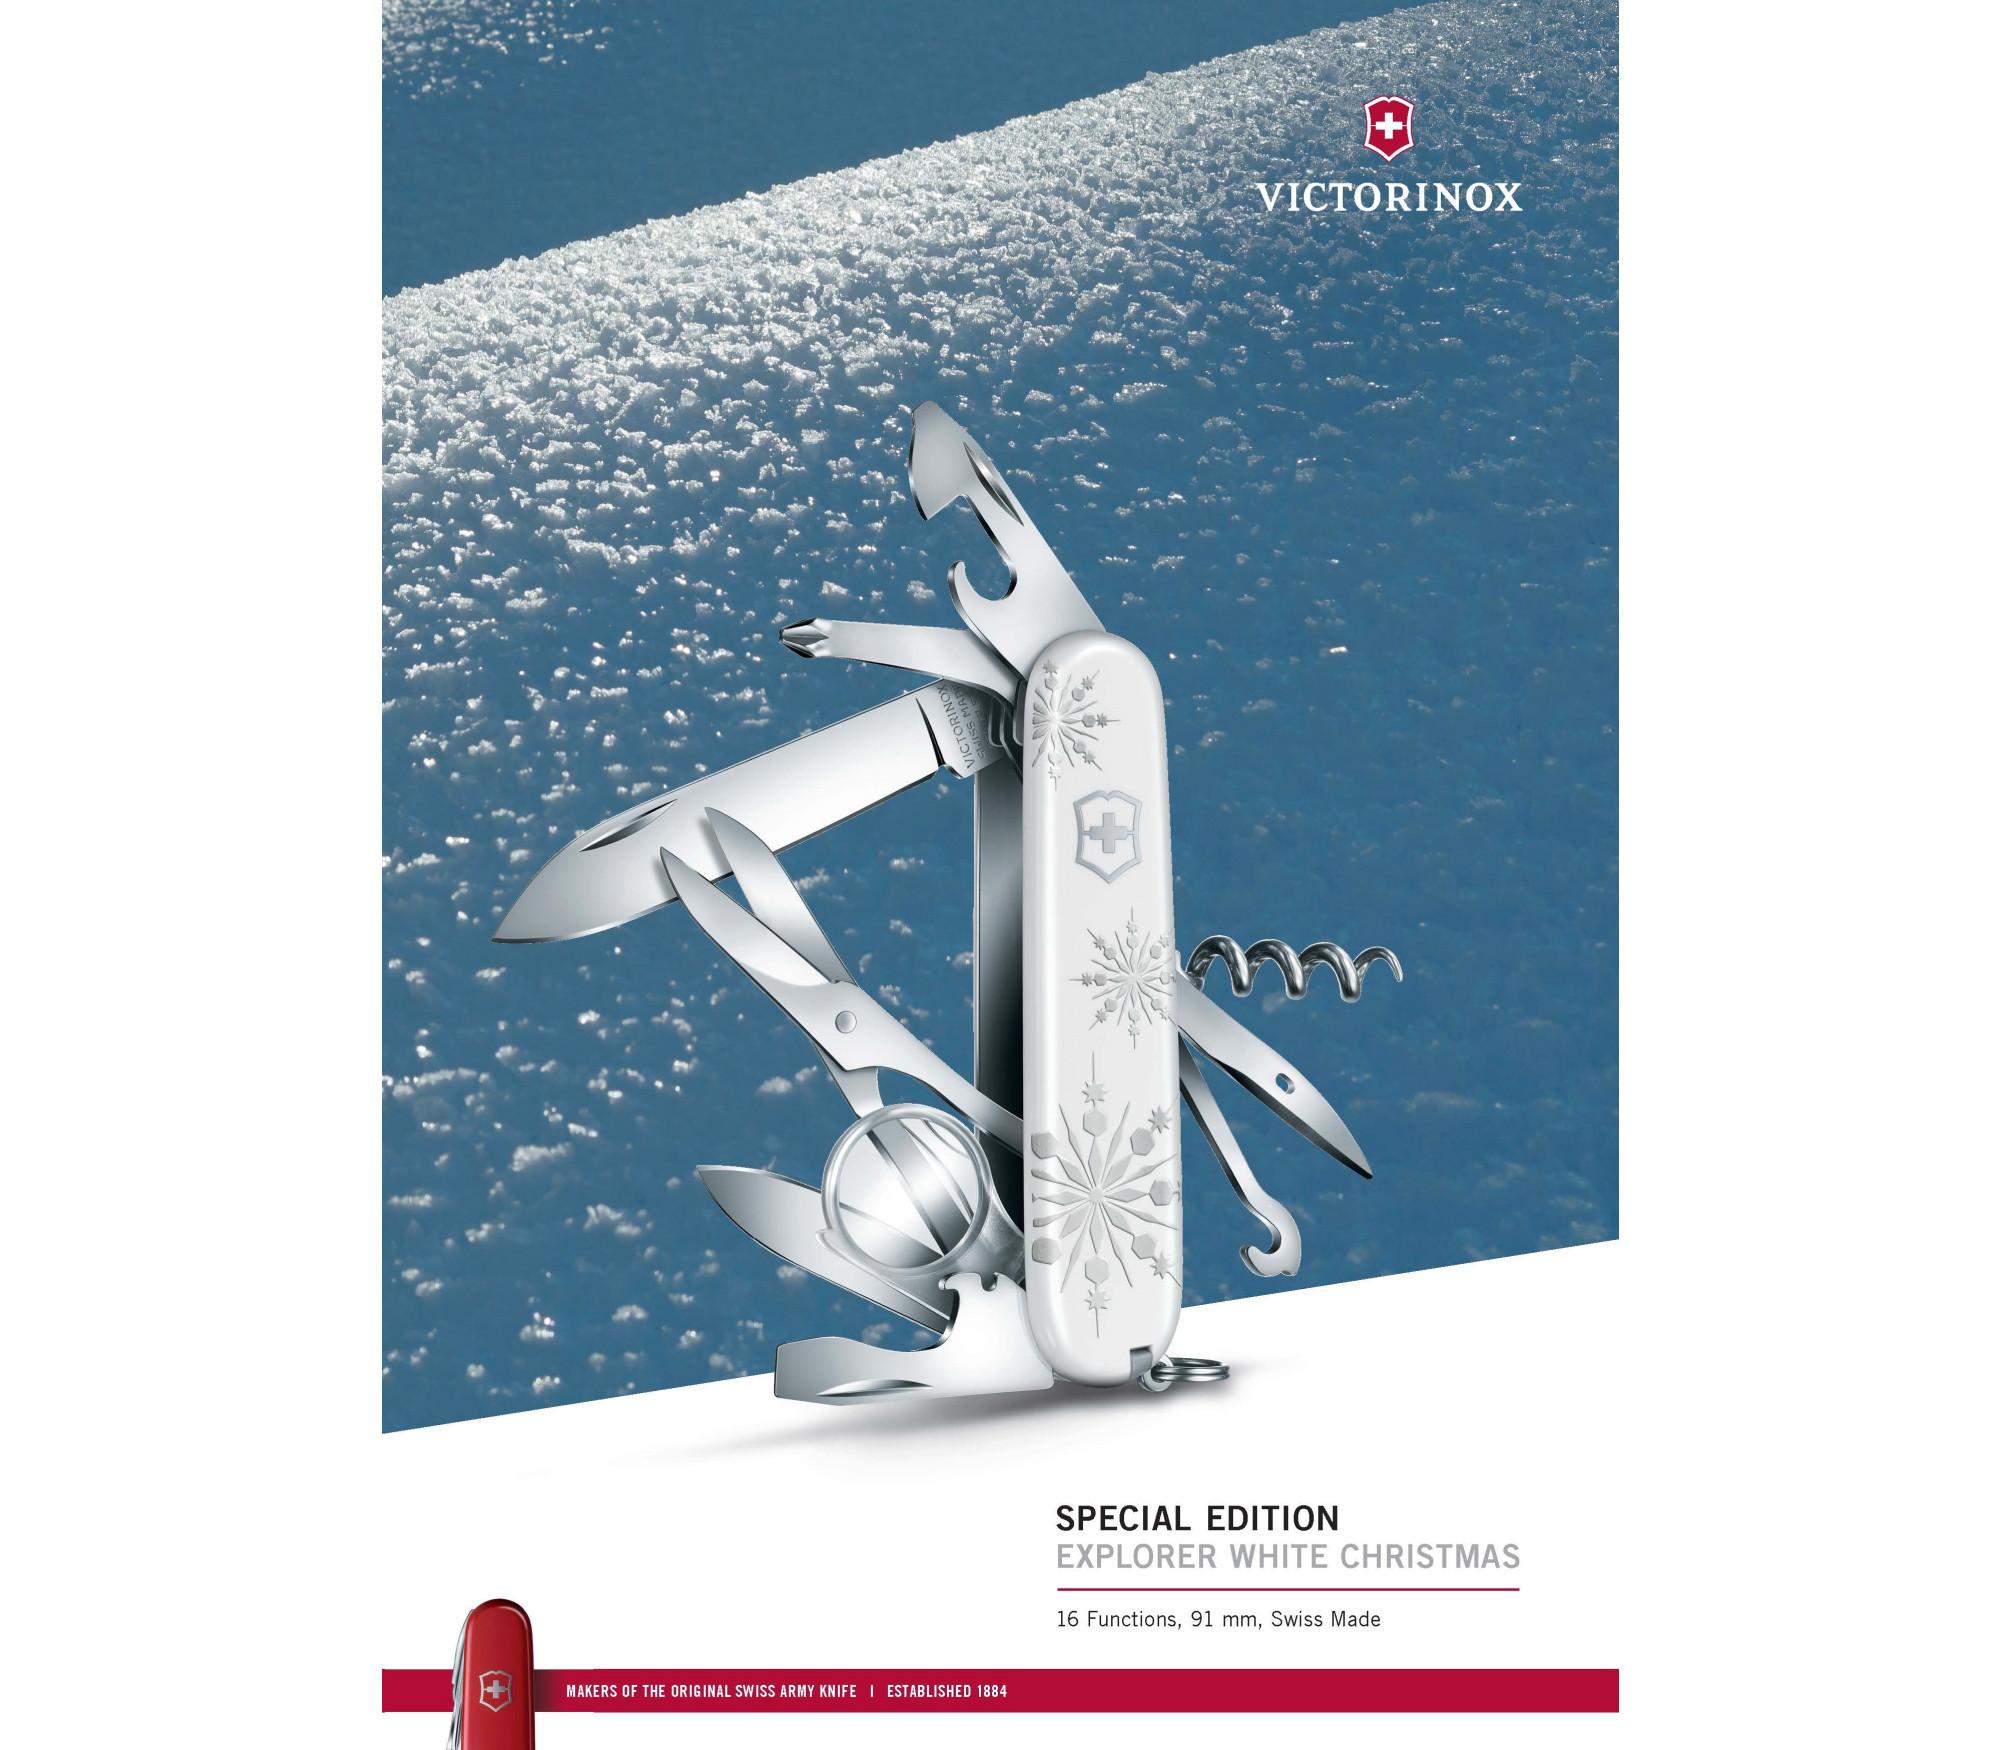 Складной нож Victorinox Explorer White Christmas Special Edition (1.6703.77) - Wenger-Victorinox.Ru